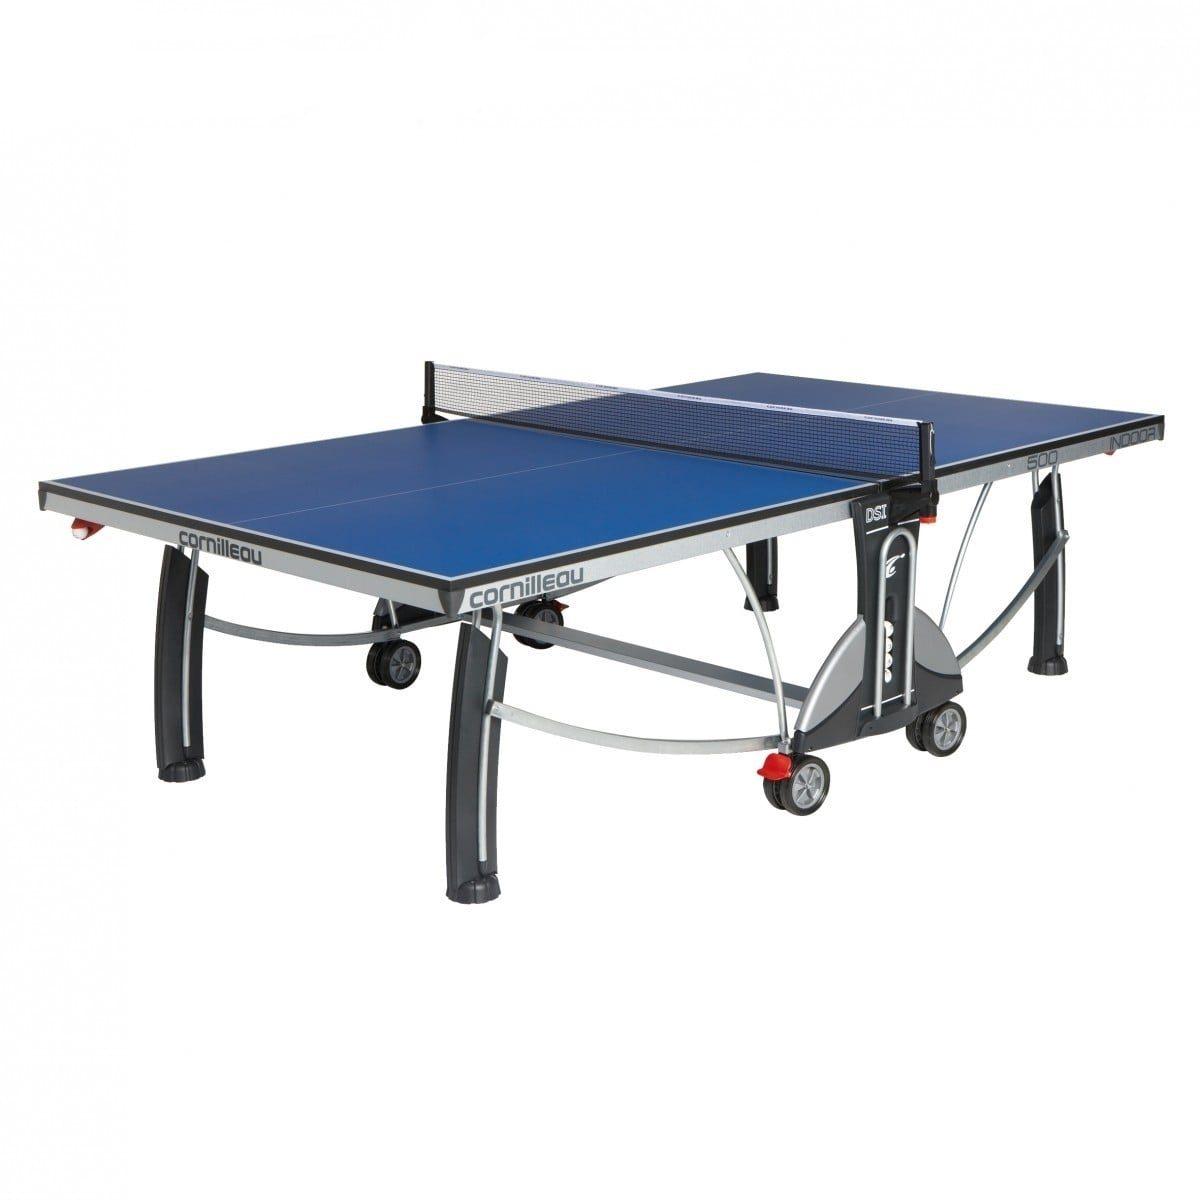 Теннисный стол Cornilleau SPORT 500 Indoor Blue